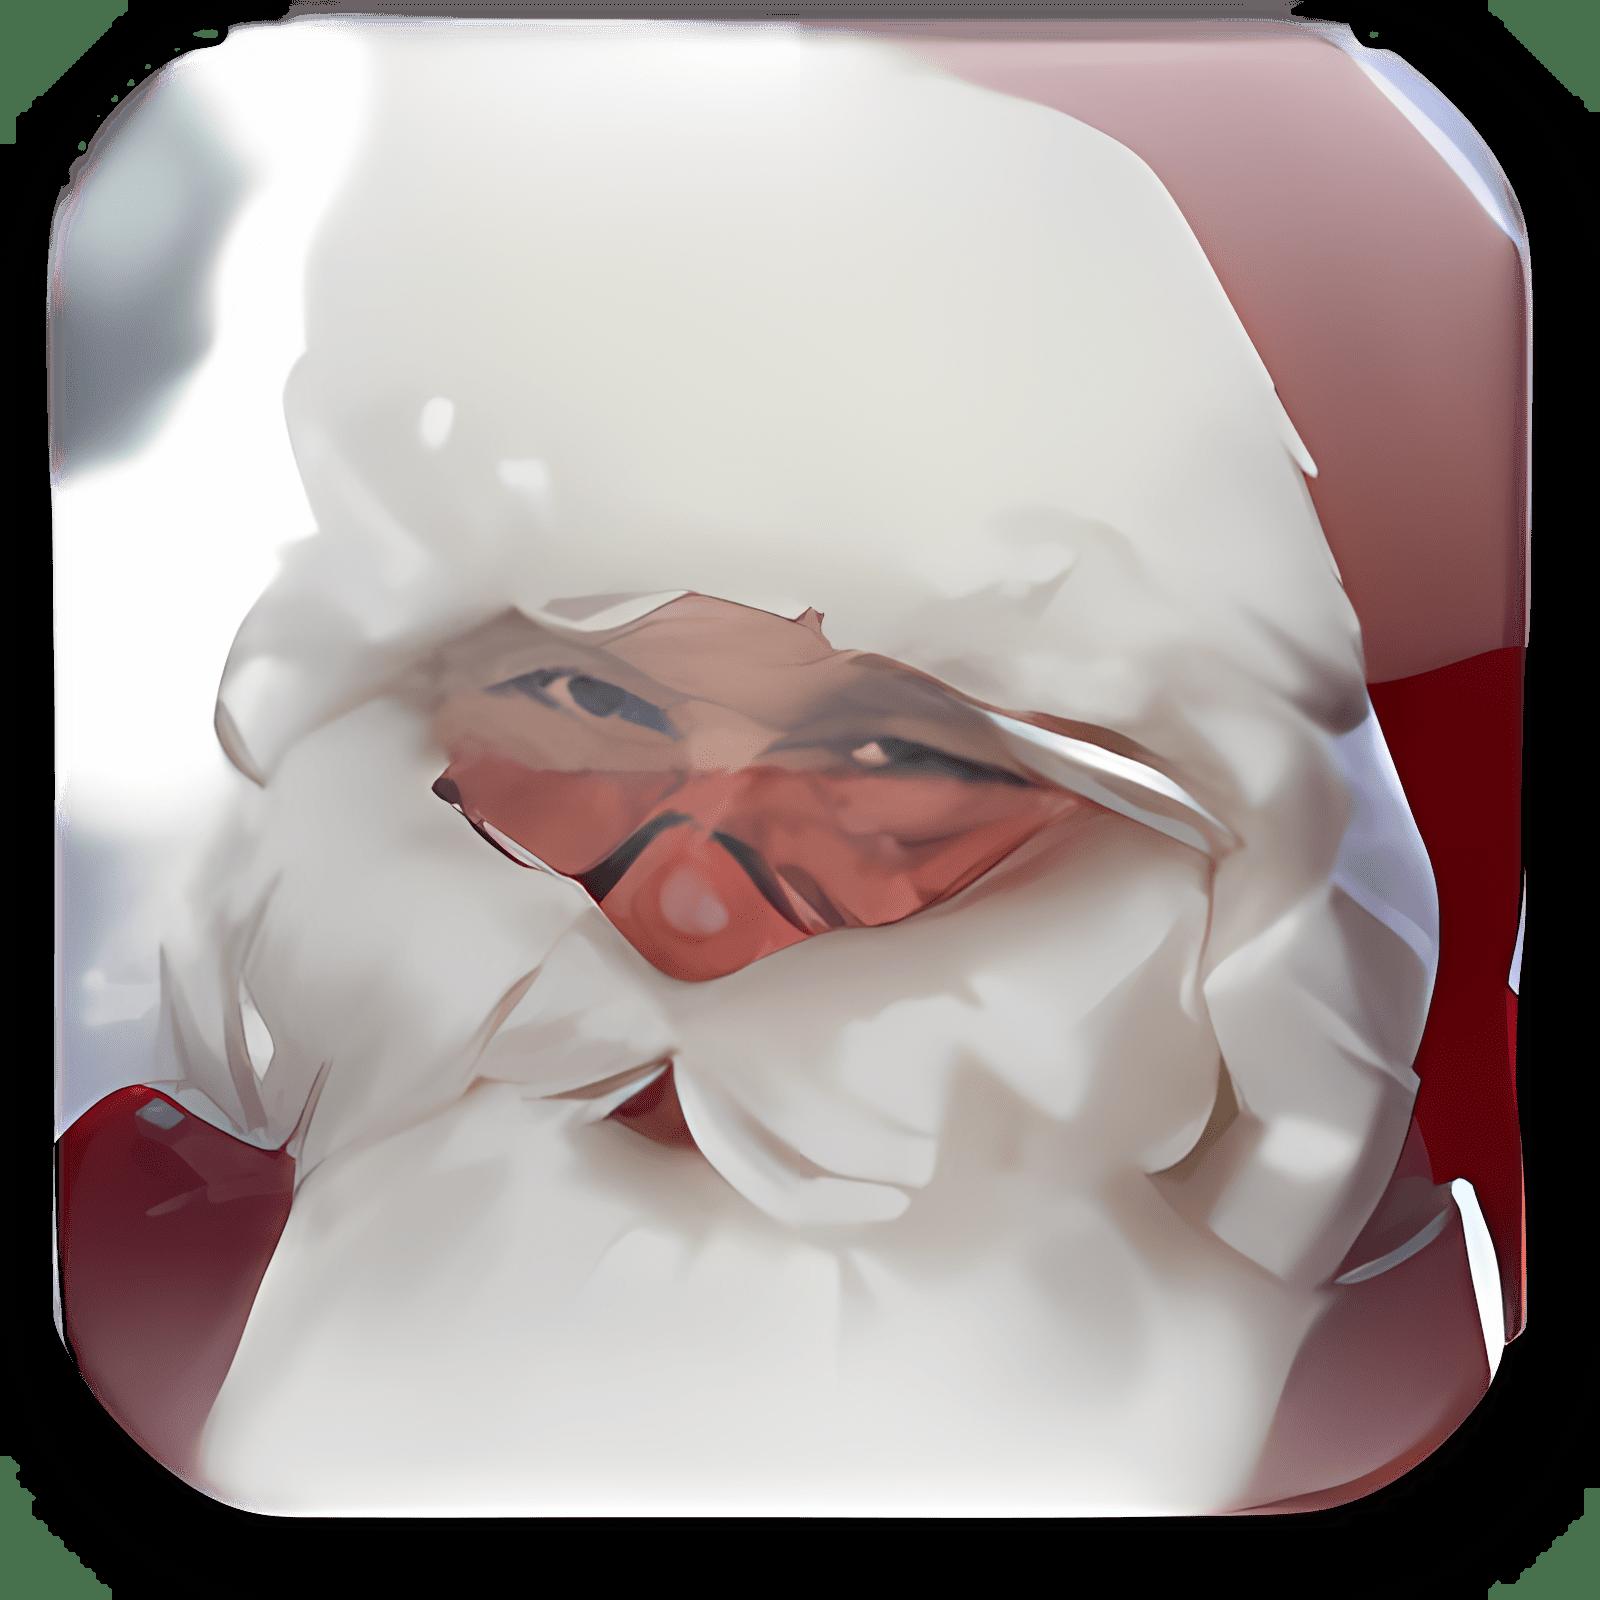 Santa Claus in trouble... again!